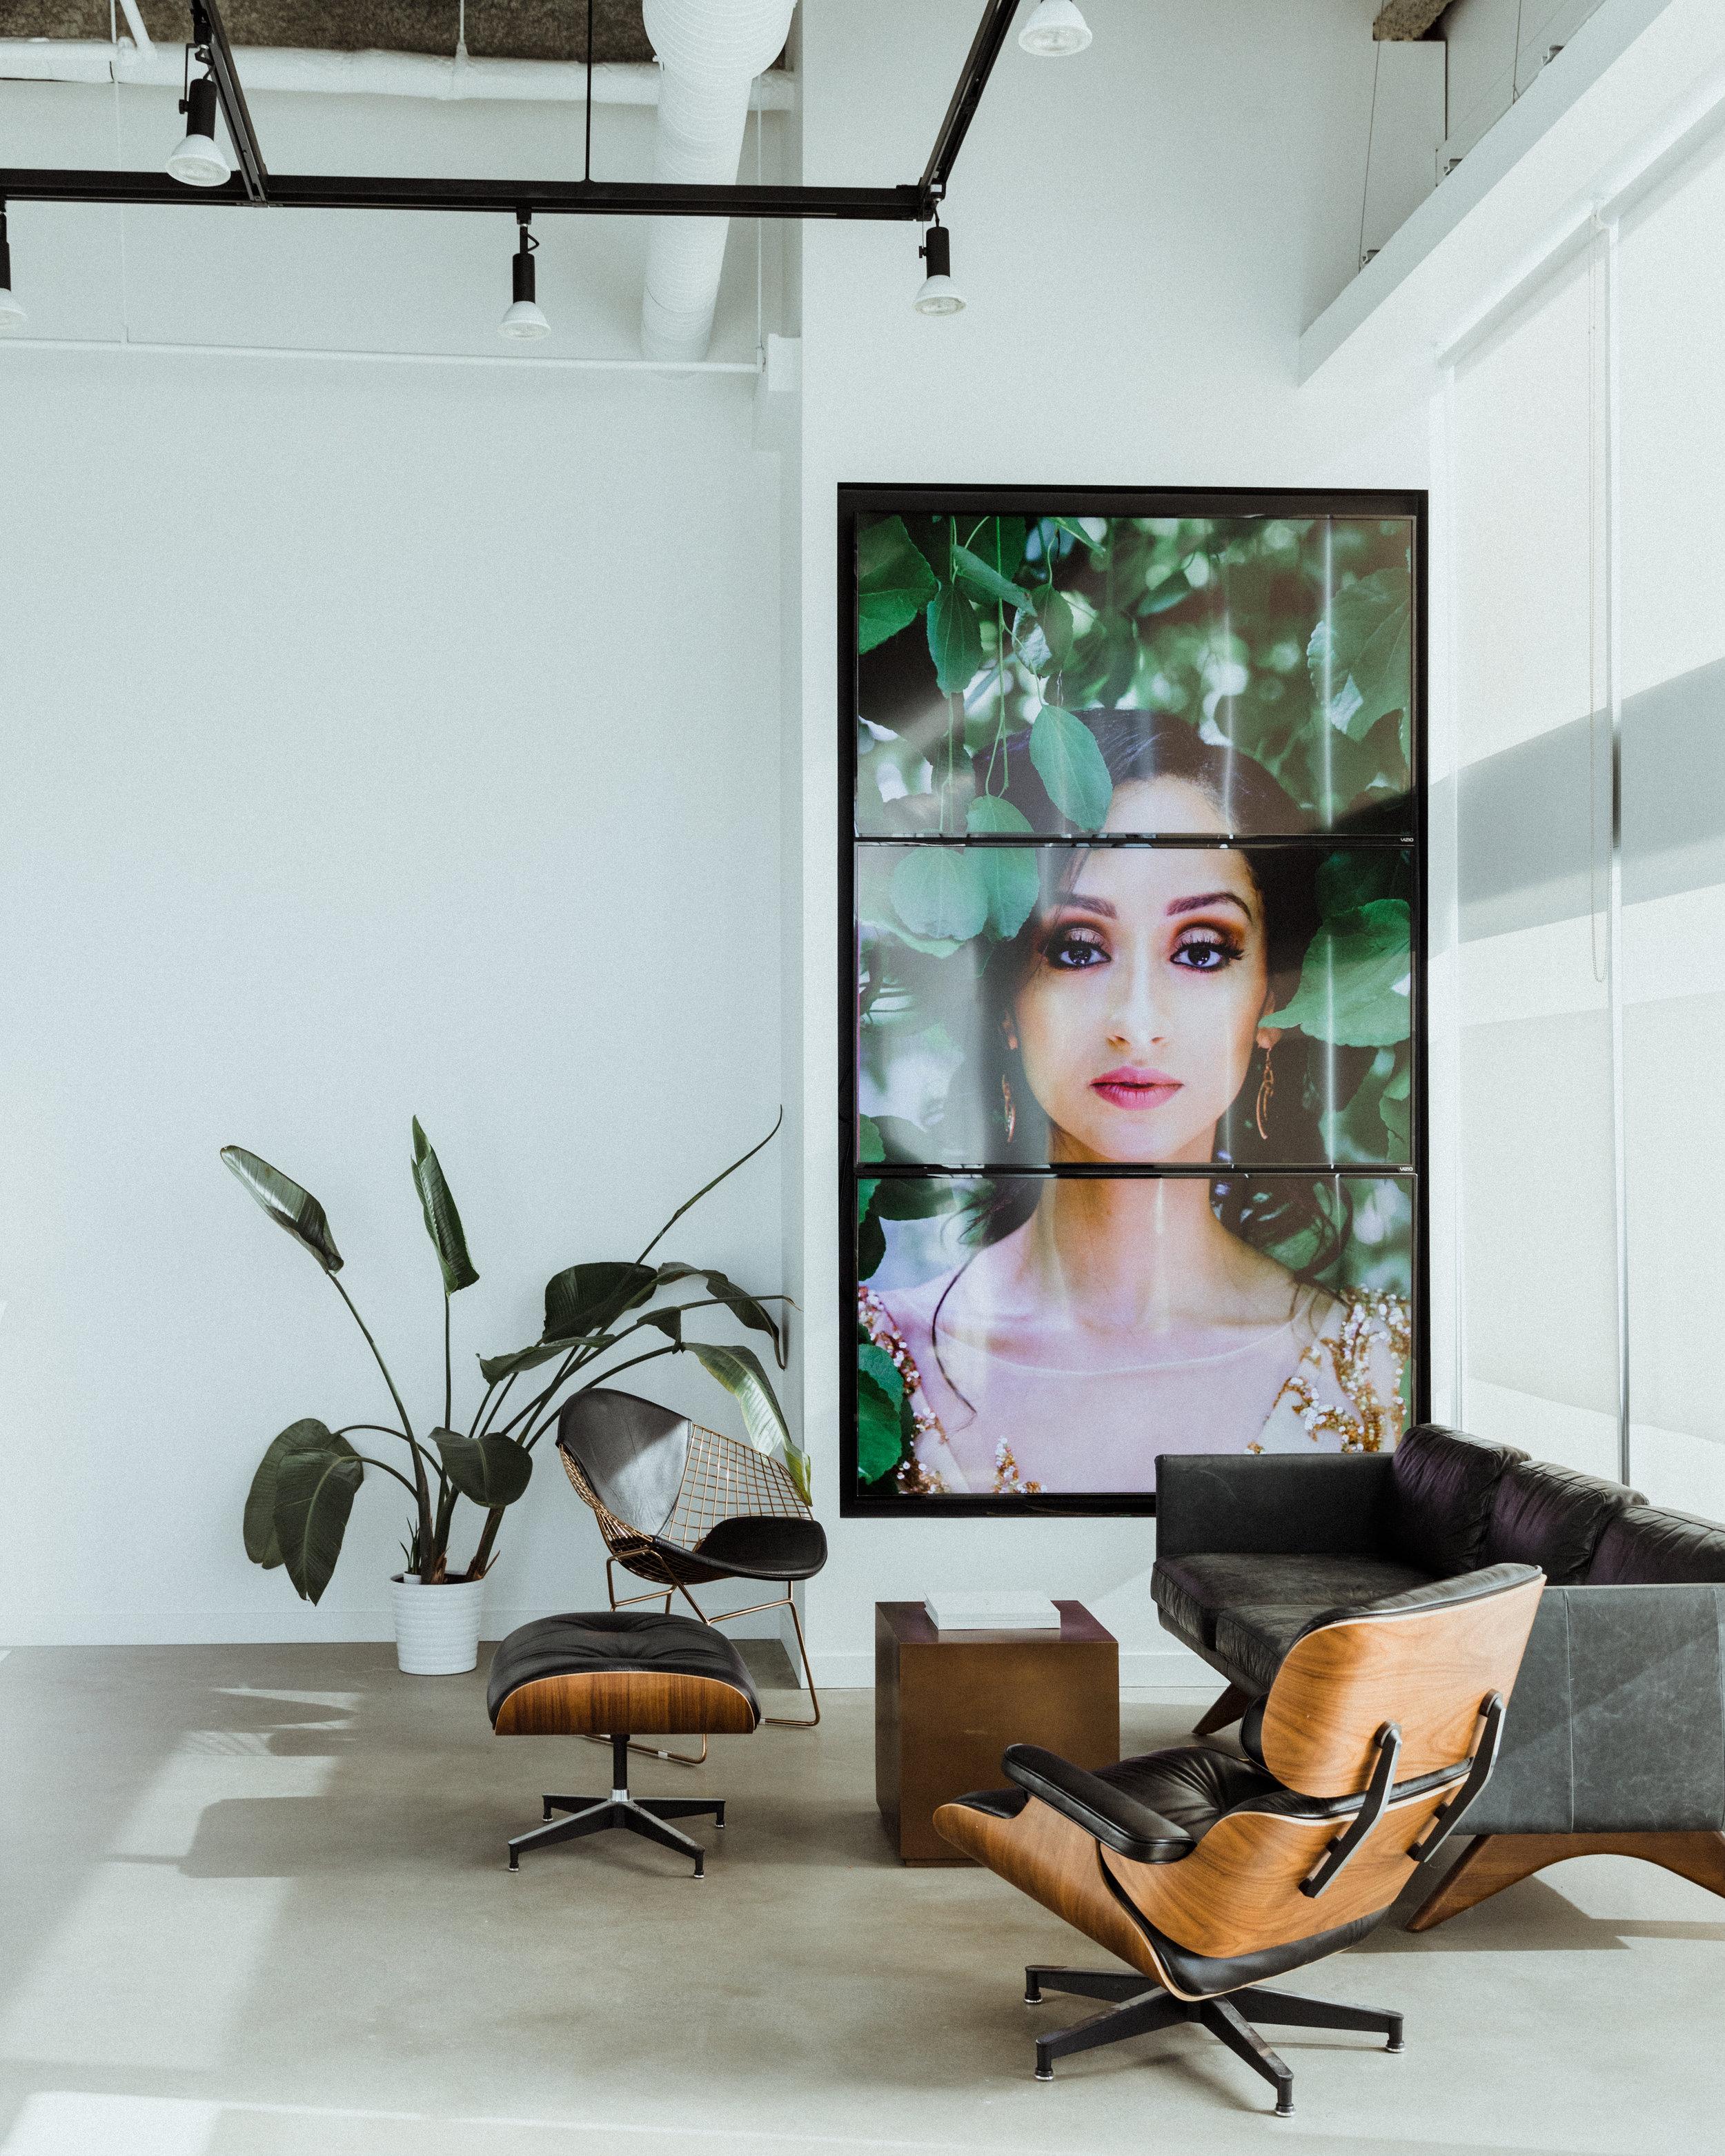 HeraStudios_Selects_Full_2019_StudioPhotos-4.jpg